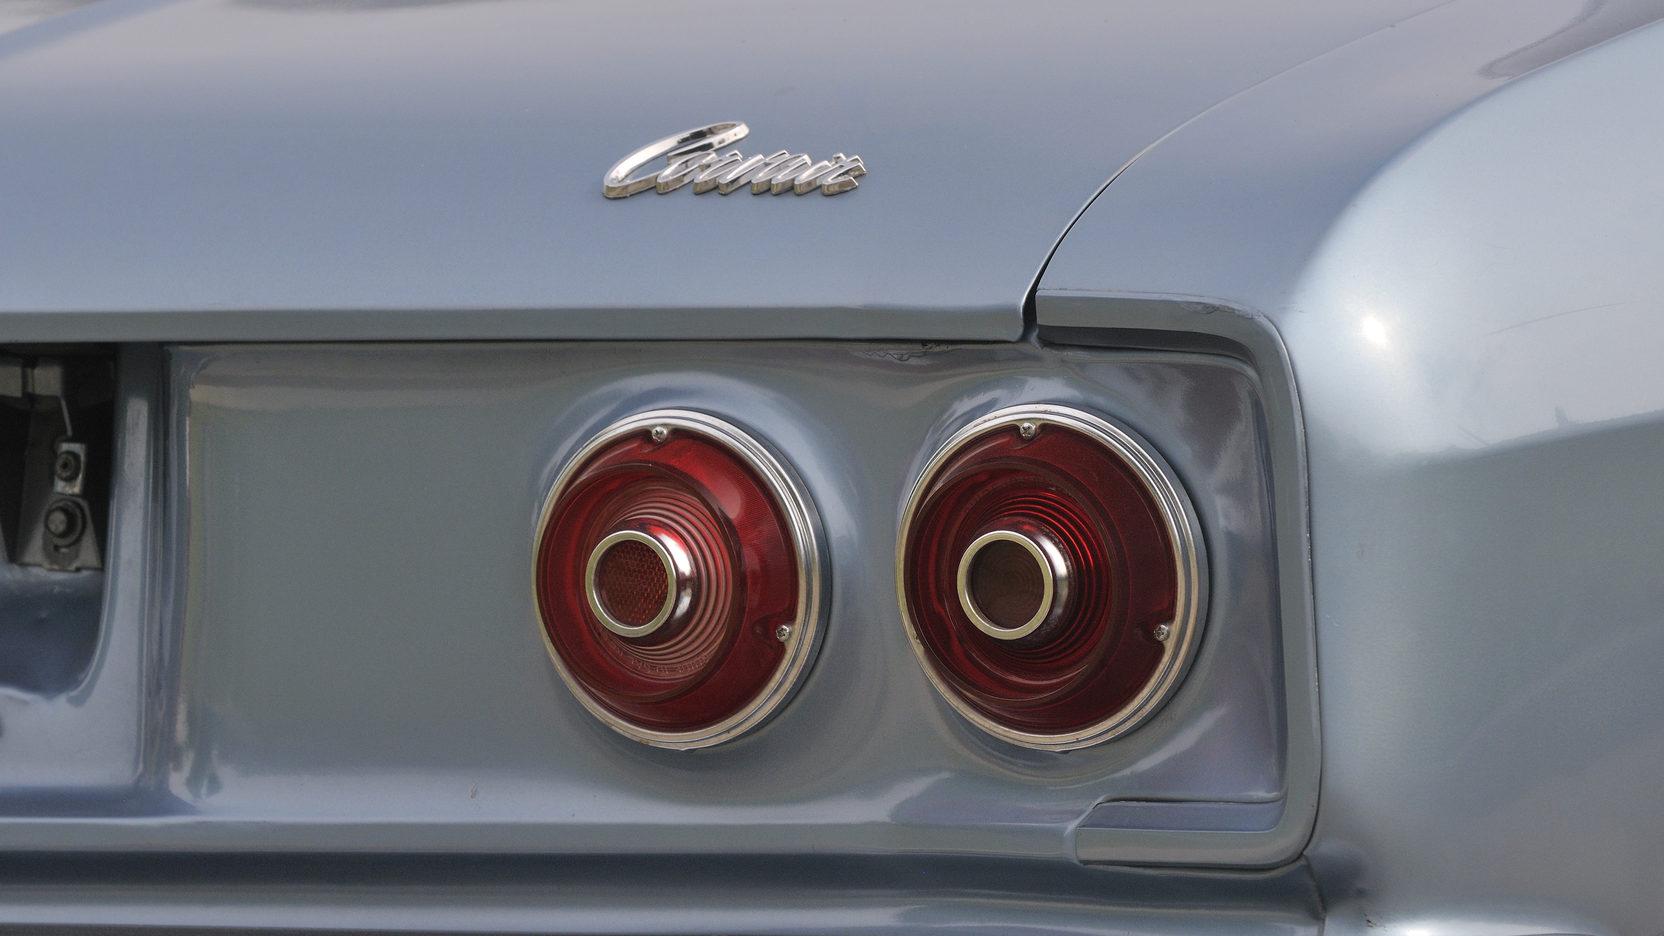 1969 Chevrolet Corvair 500 badge